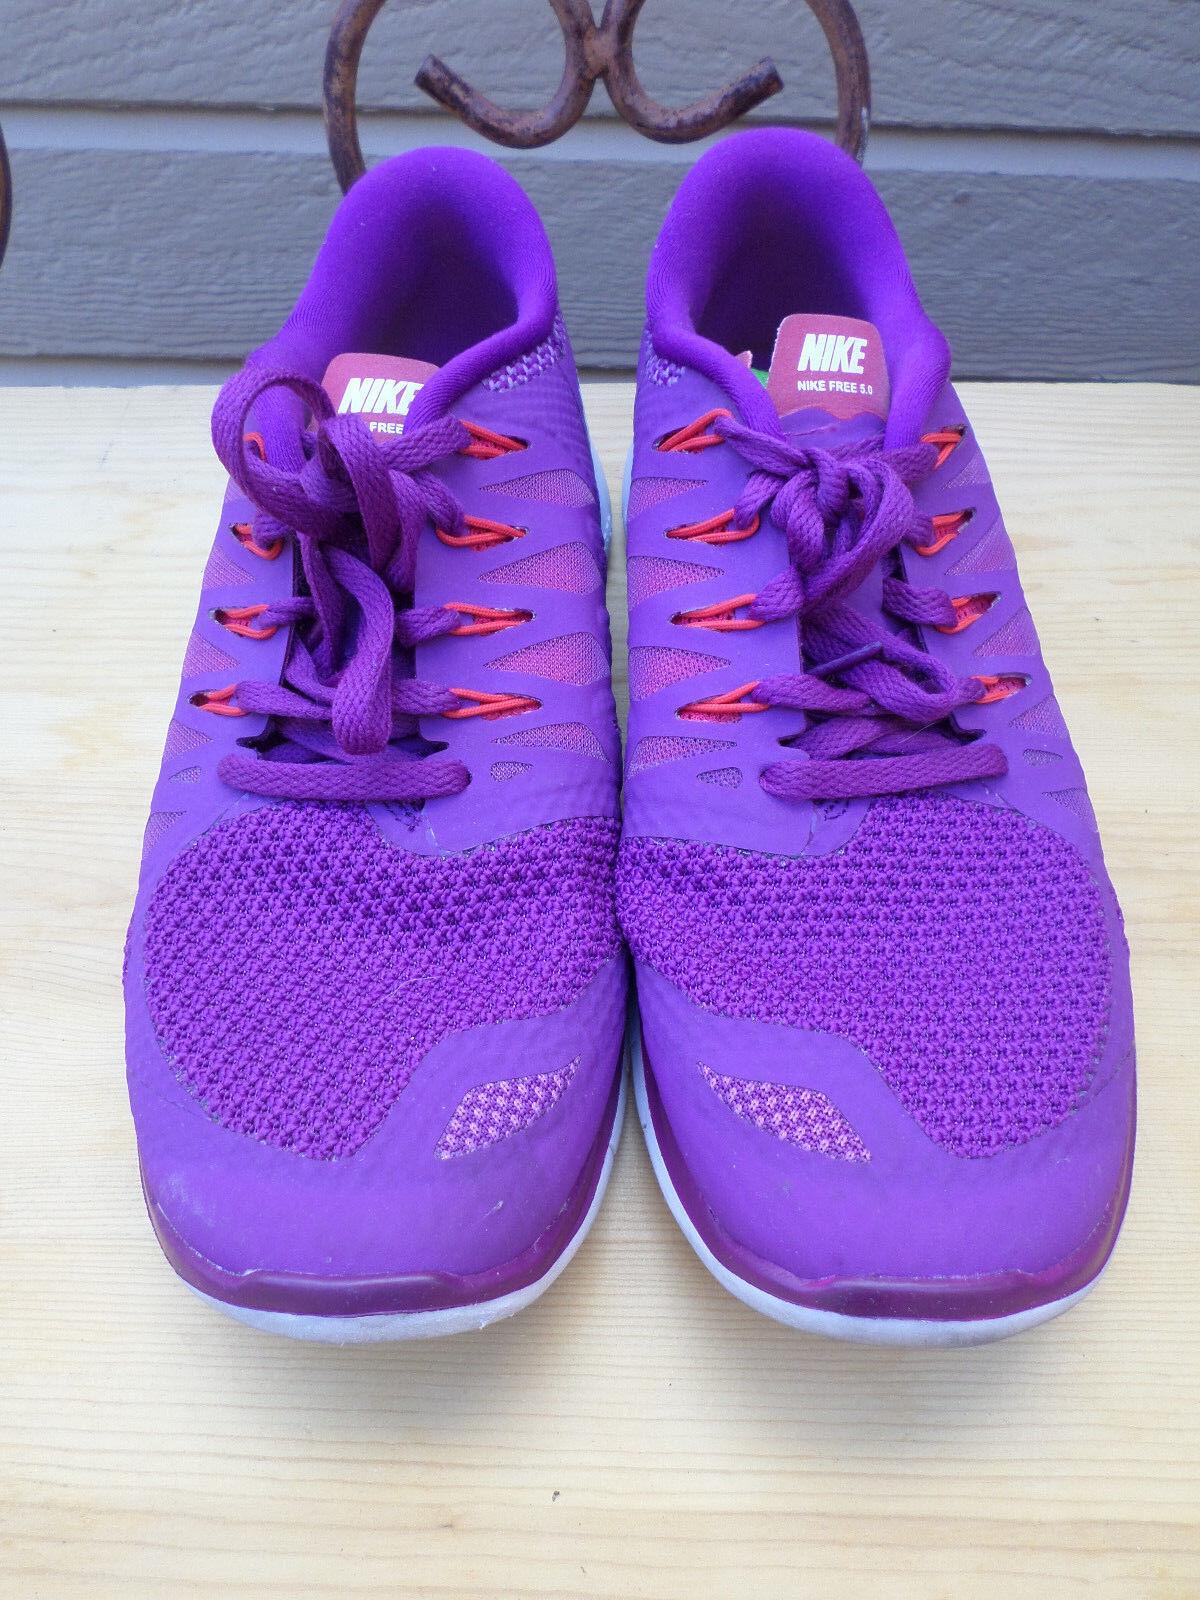 Nike Free 5.0 Purple Running shoes Women's 7.5  (642199-501)